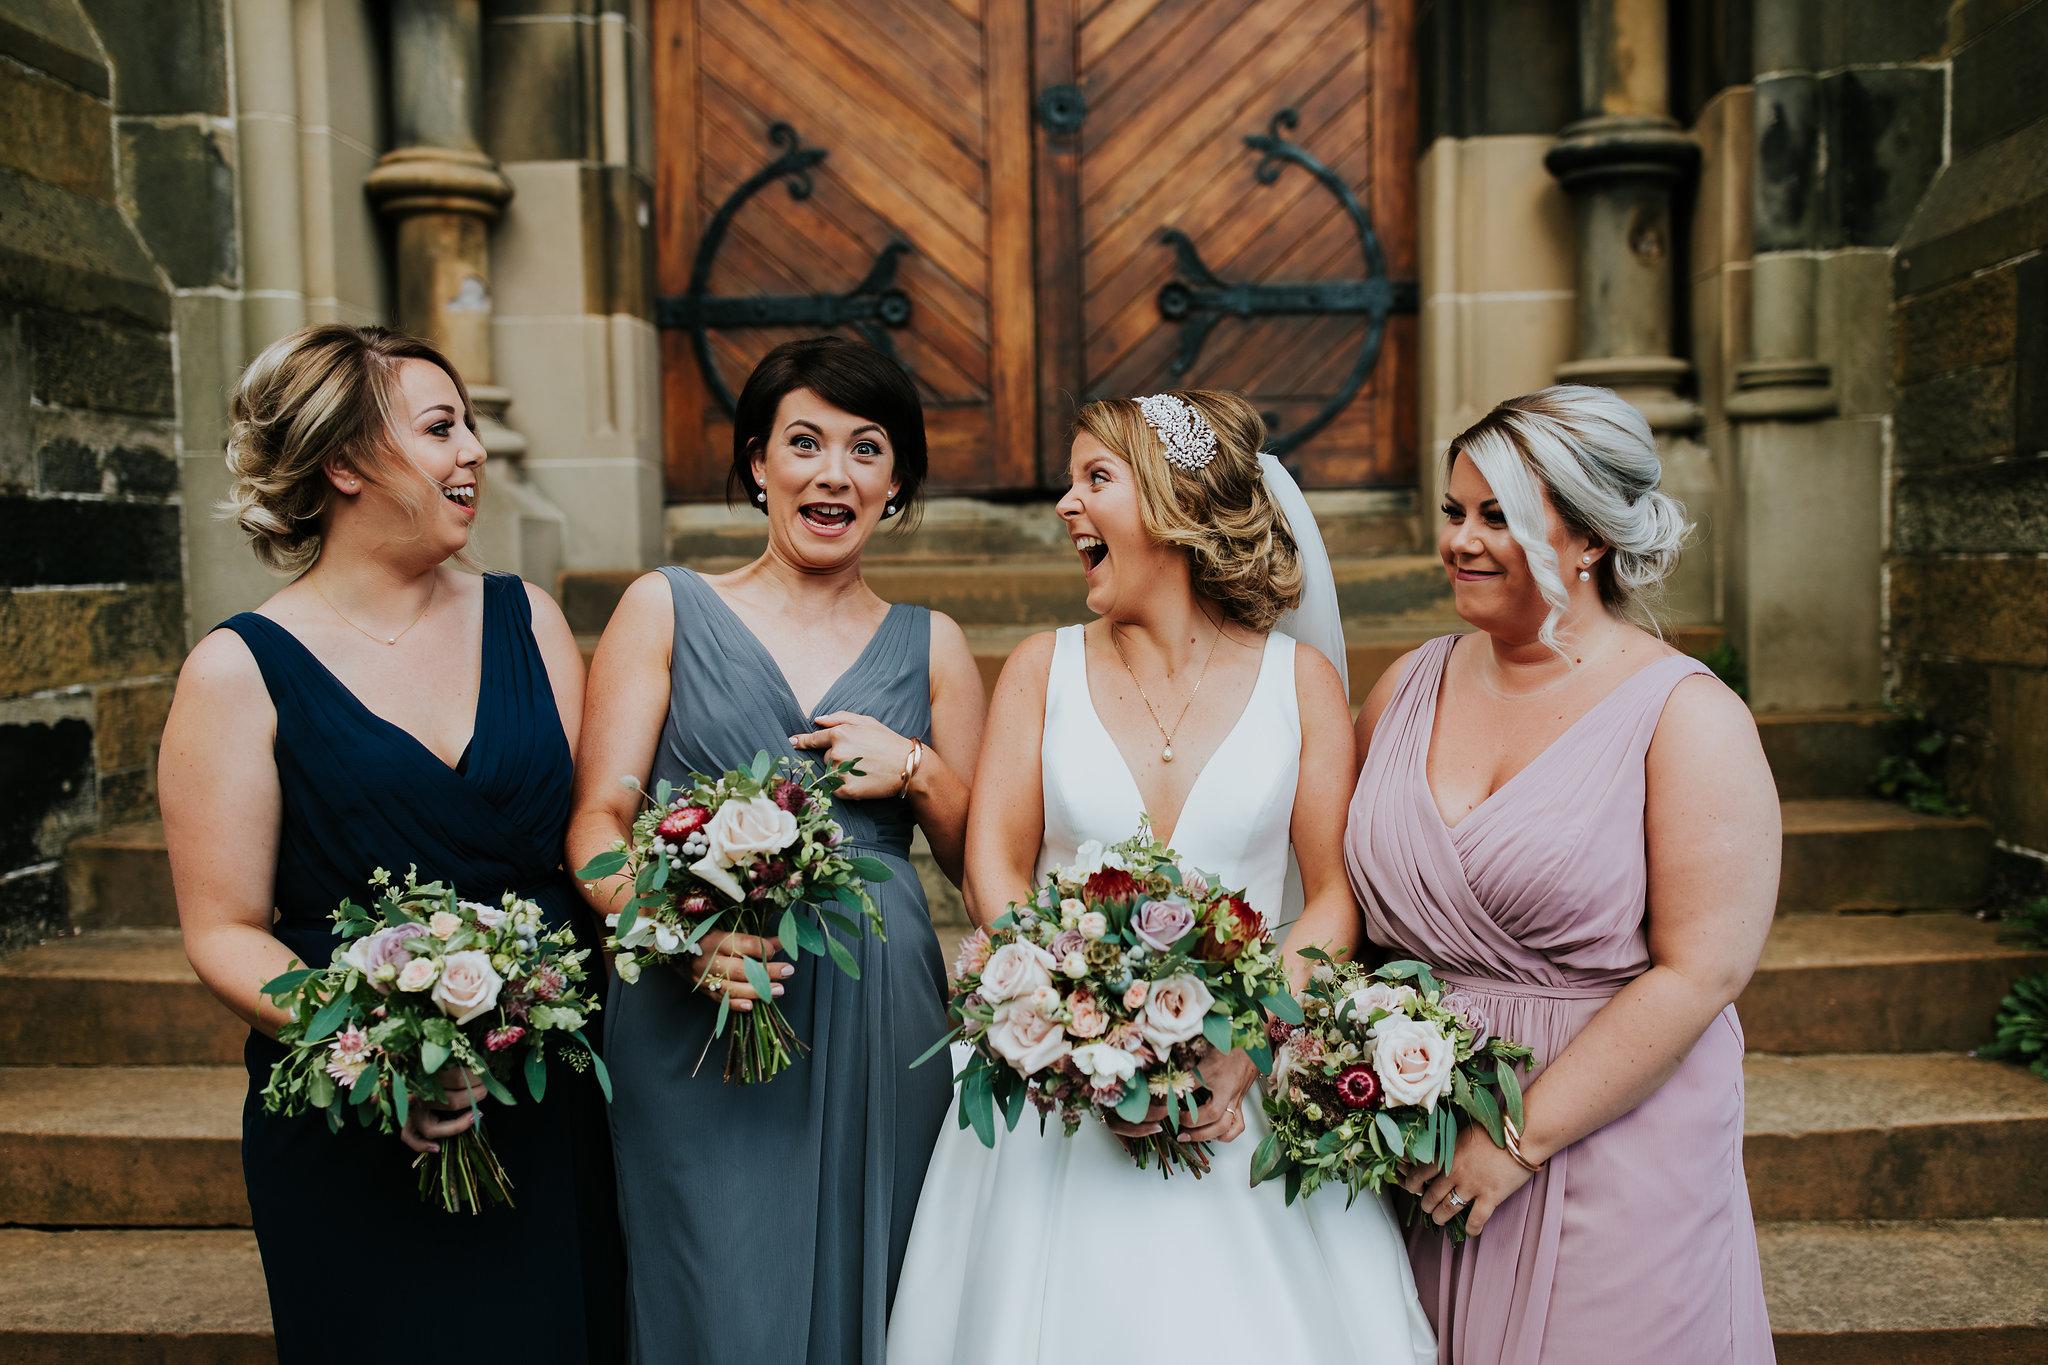 Cottiers wedding lavender and rose wedding florists scotland11.jpg